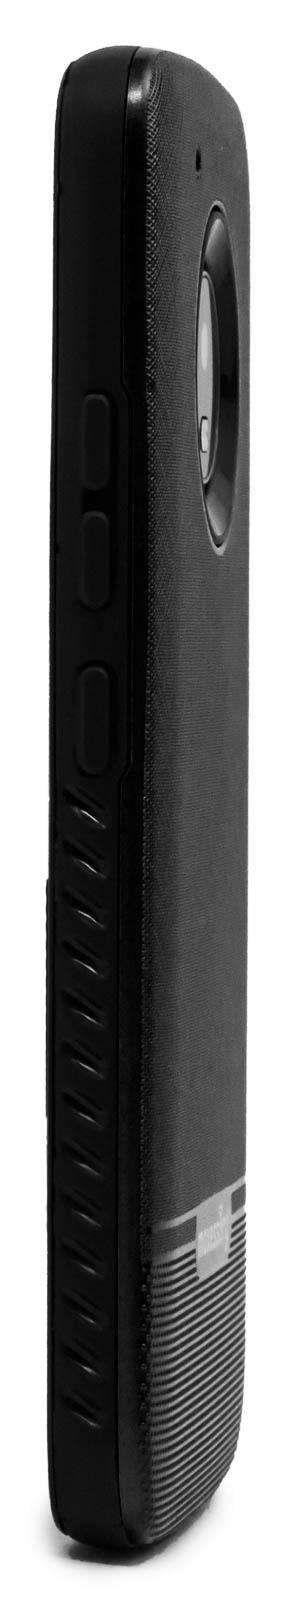 Moto-G5-Plus-Case-Moto-X-17-Case-Ultra-Thin-Hard-Body-Tactile-Shell-Cover thumbnail 3